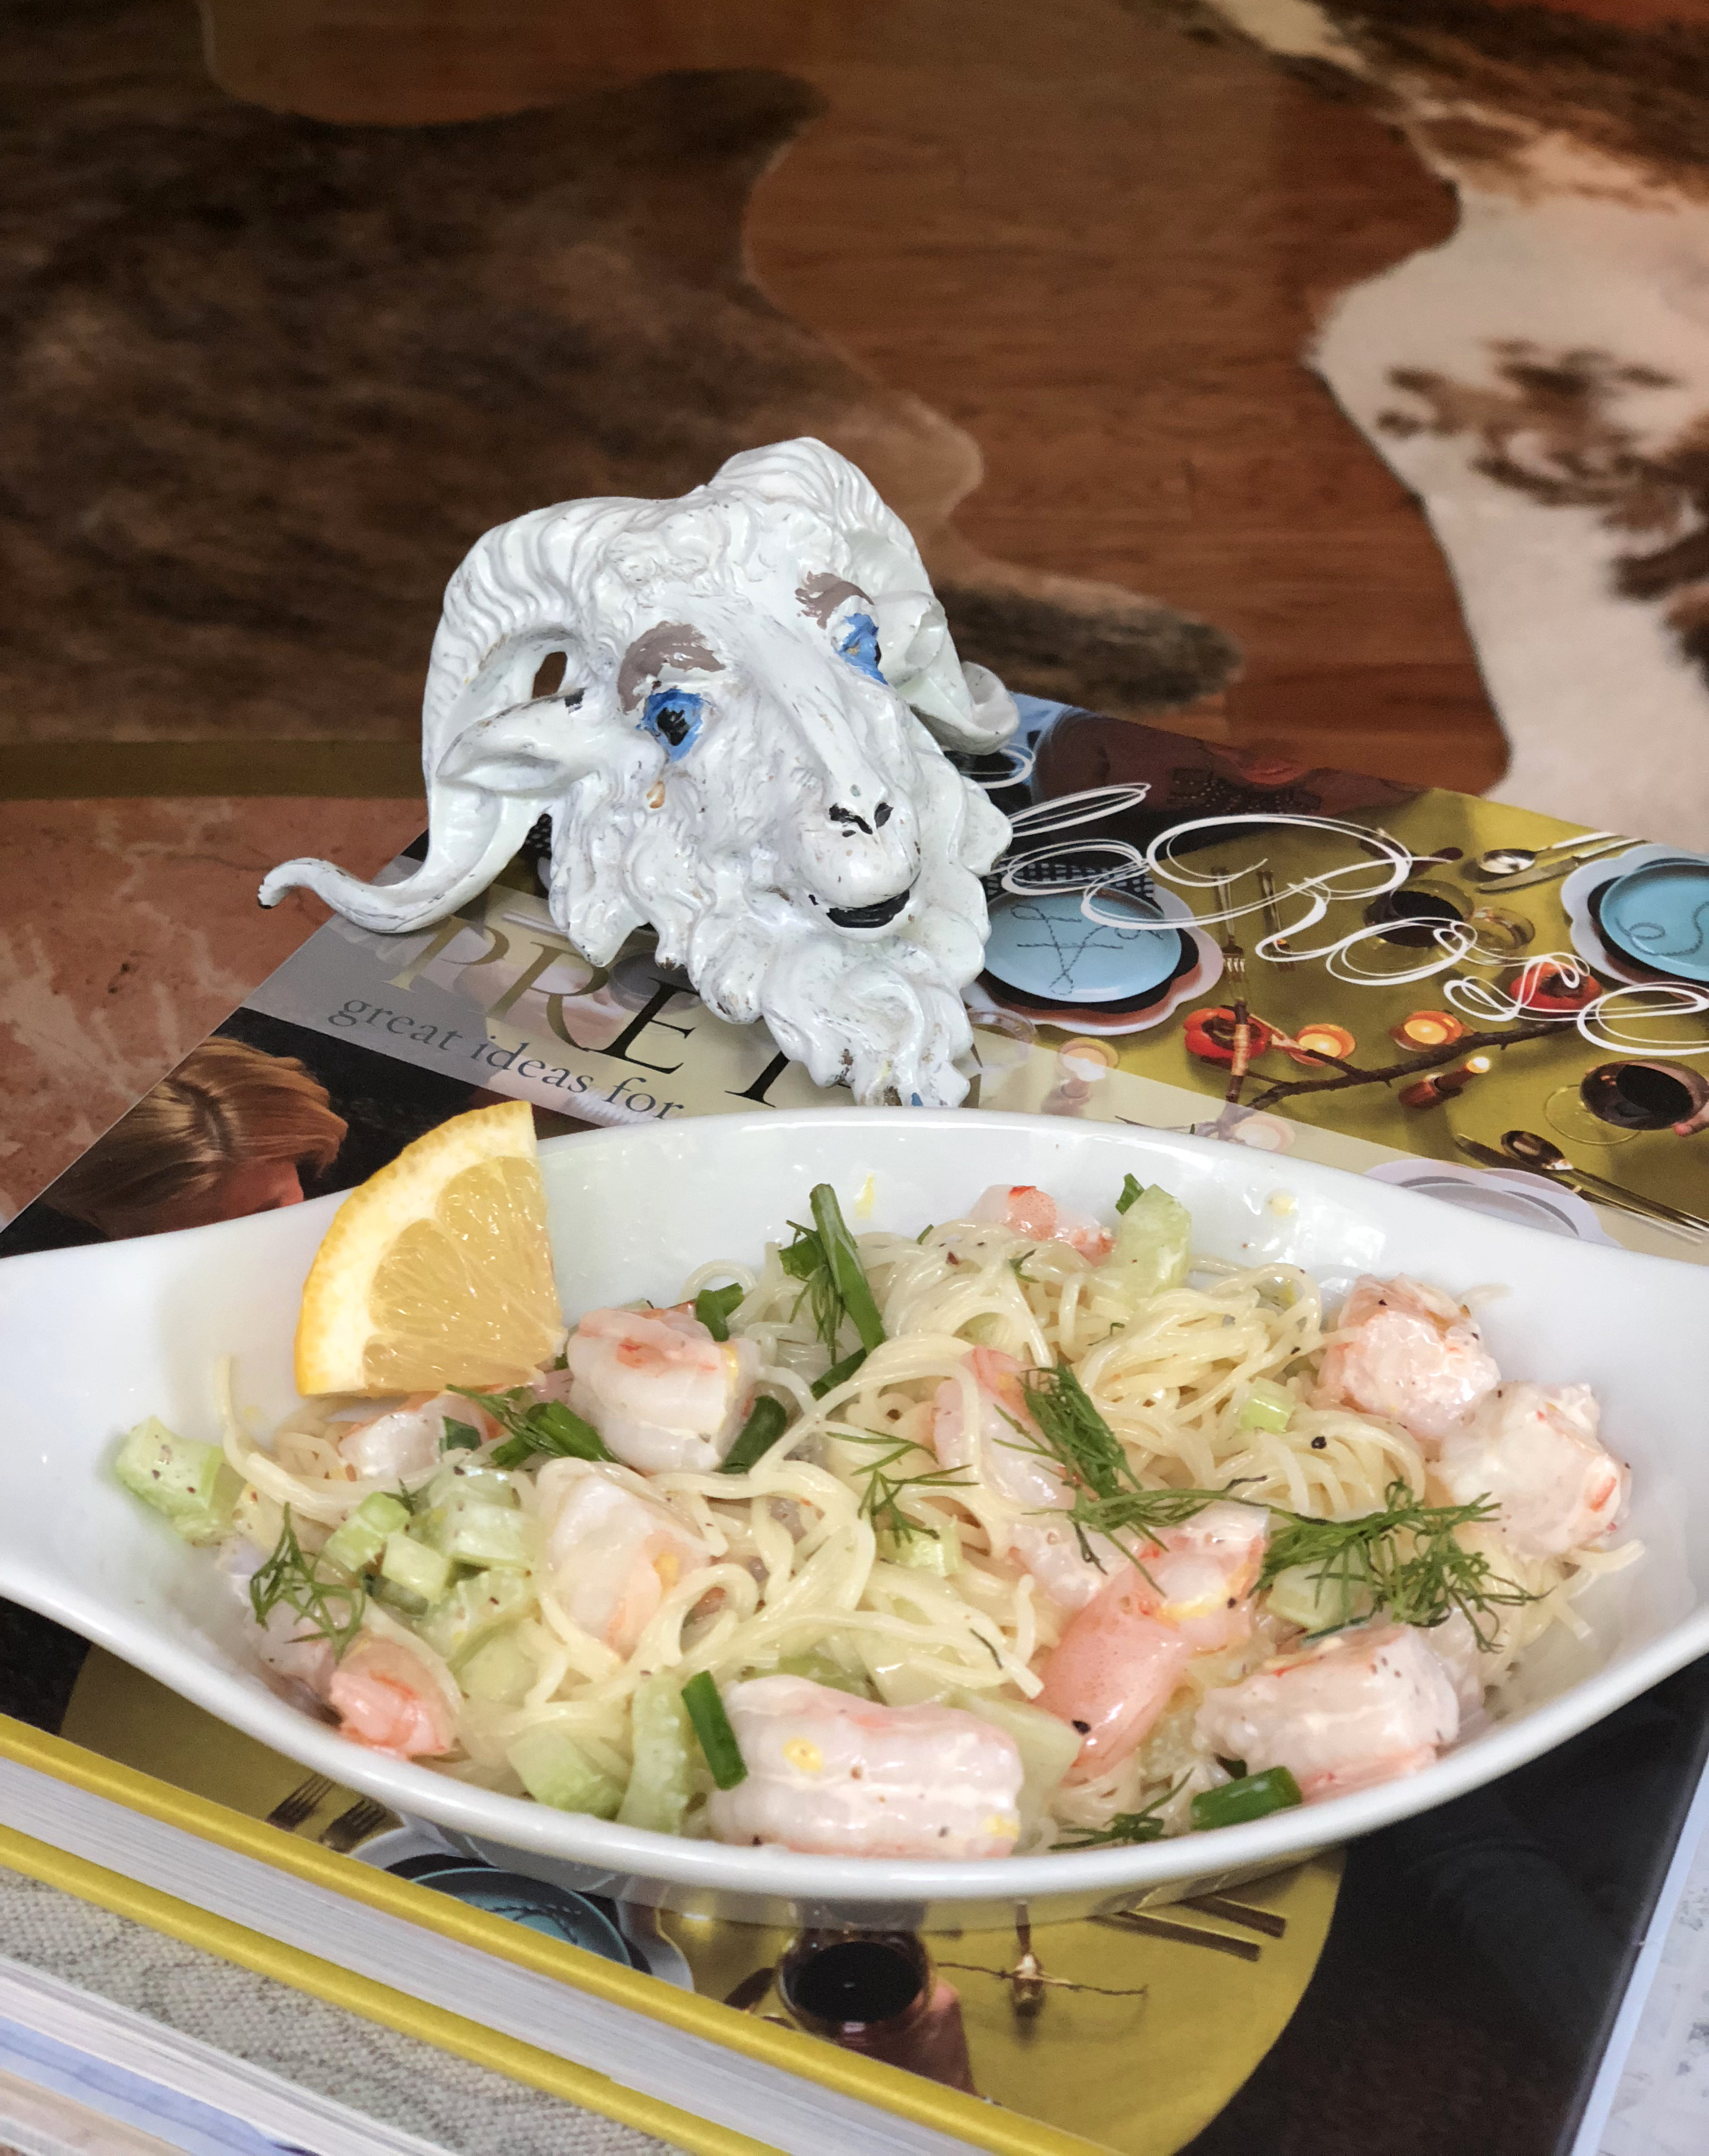 Entree Seafood Lemony Shrimp Scampi